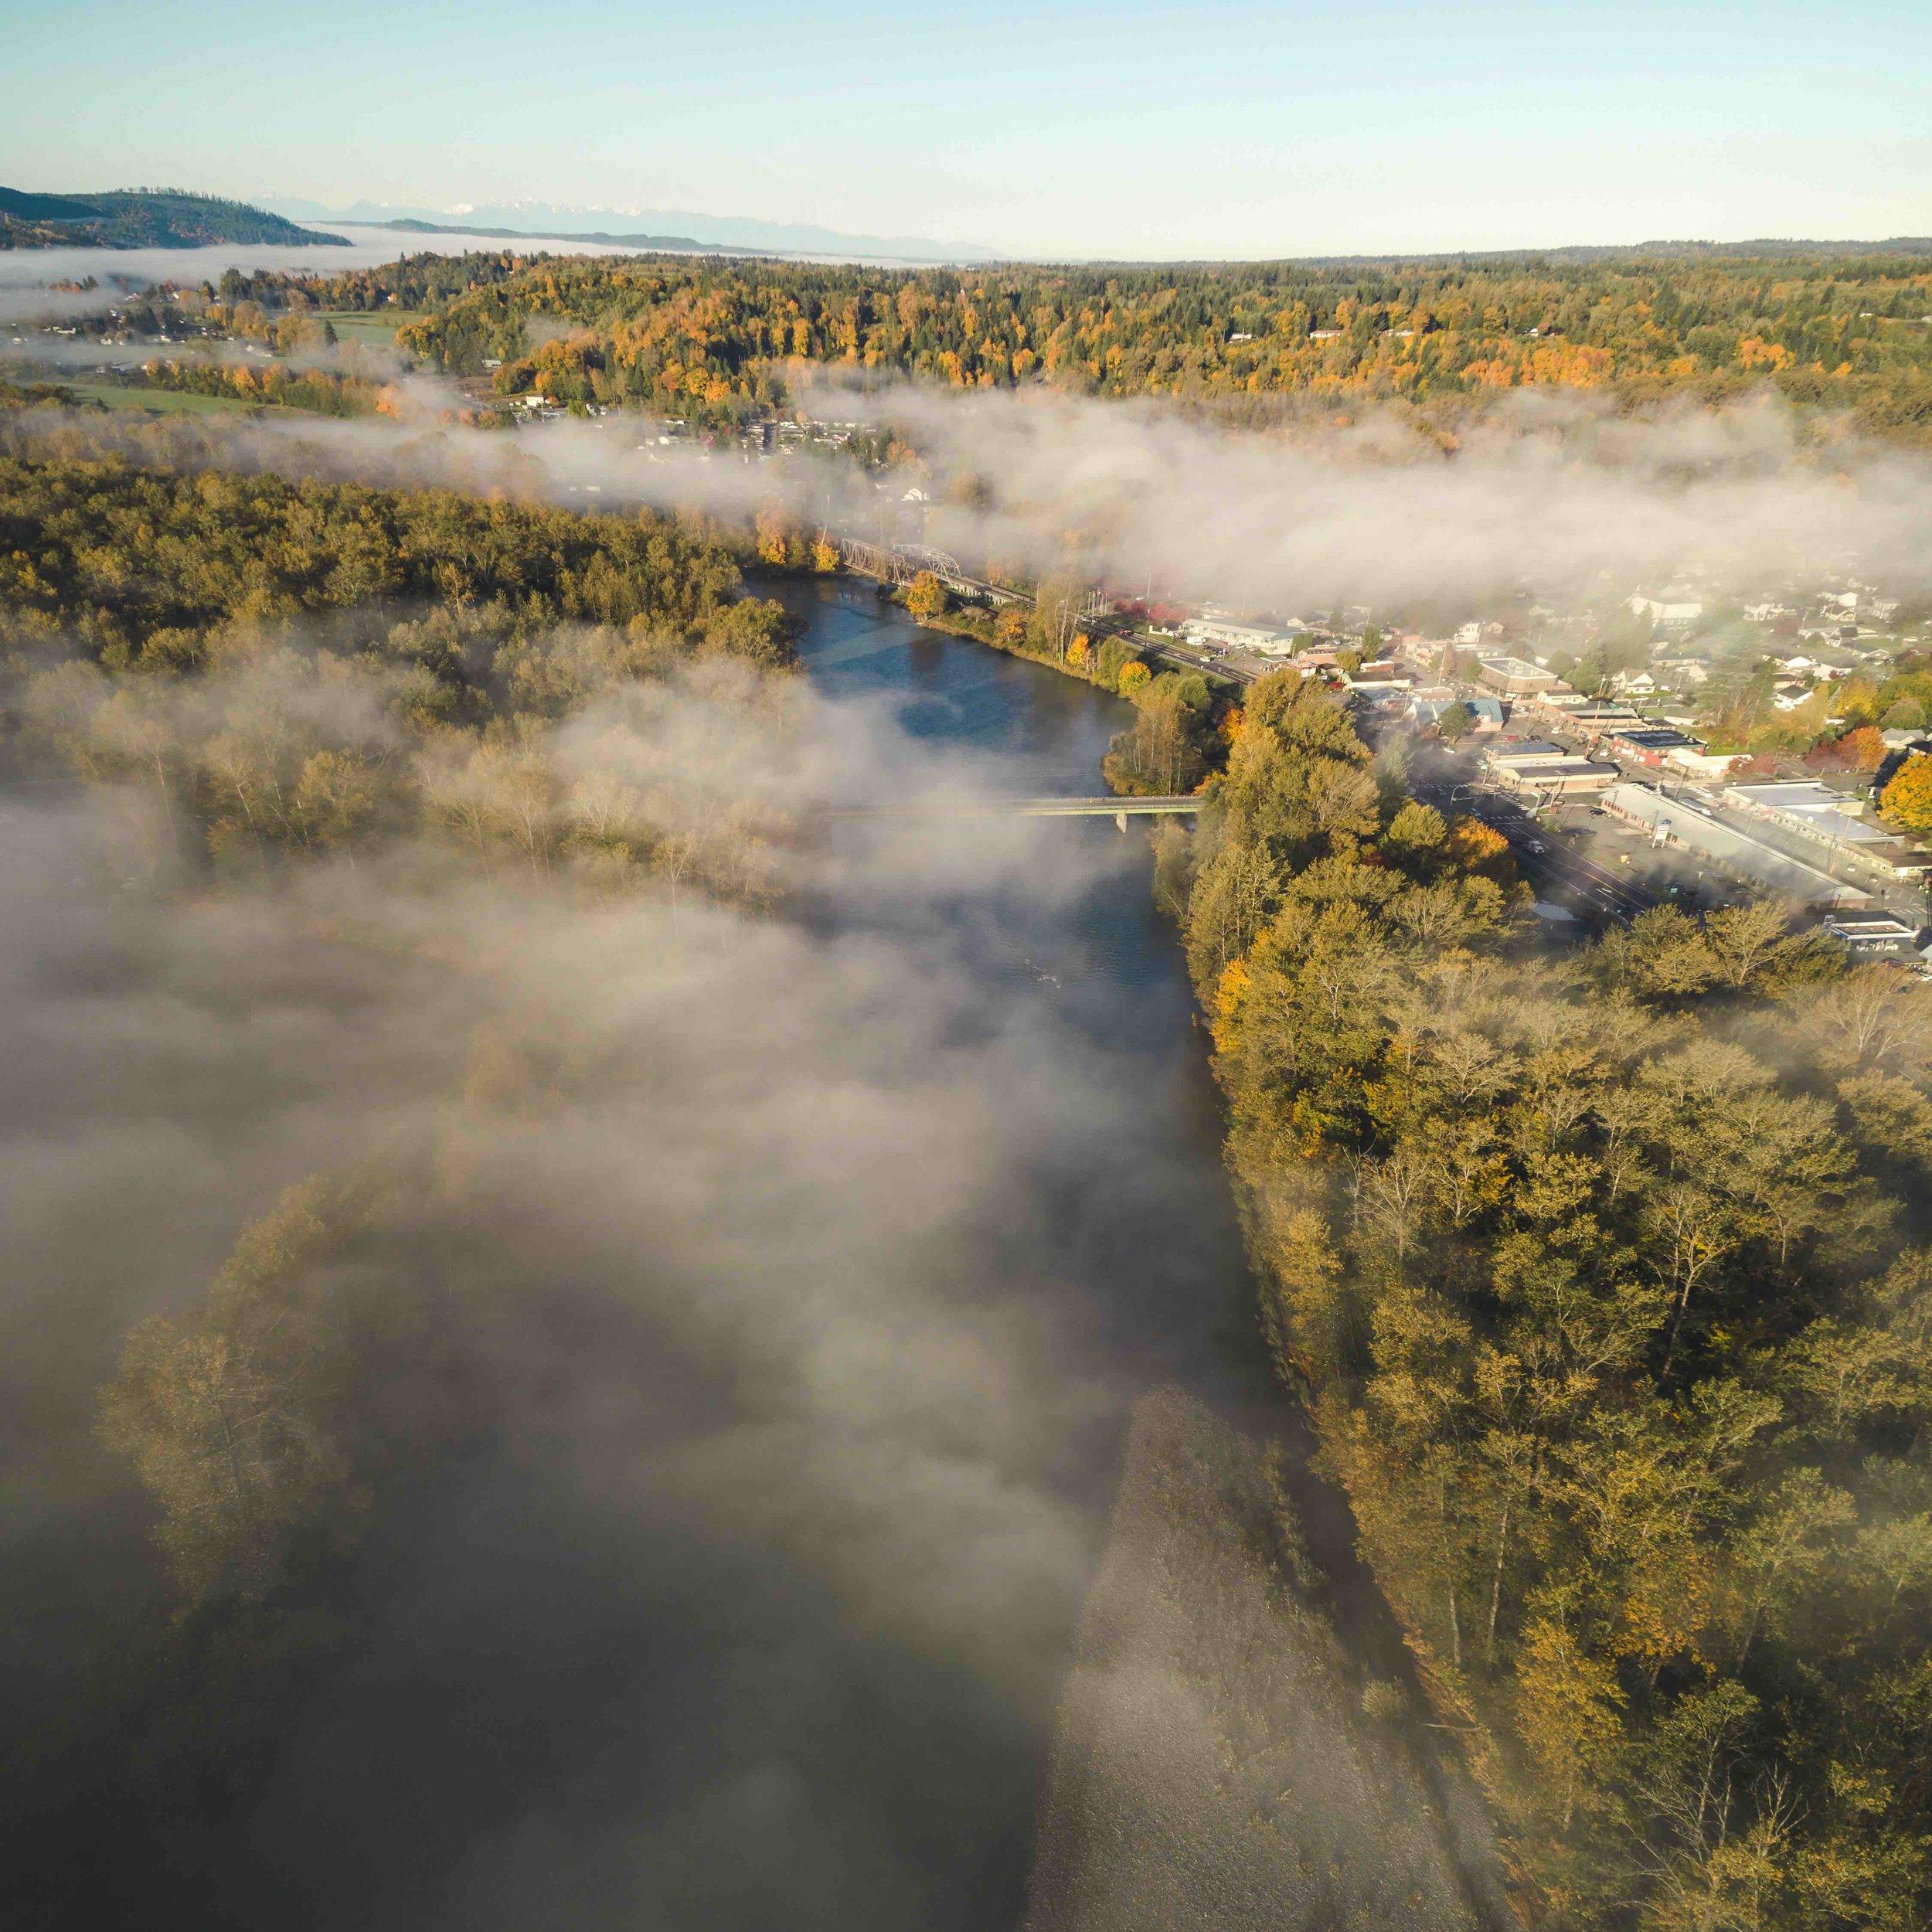 Sultan_Washington_Lowland_Fog_Helicopter_Aerial_View.jpg